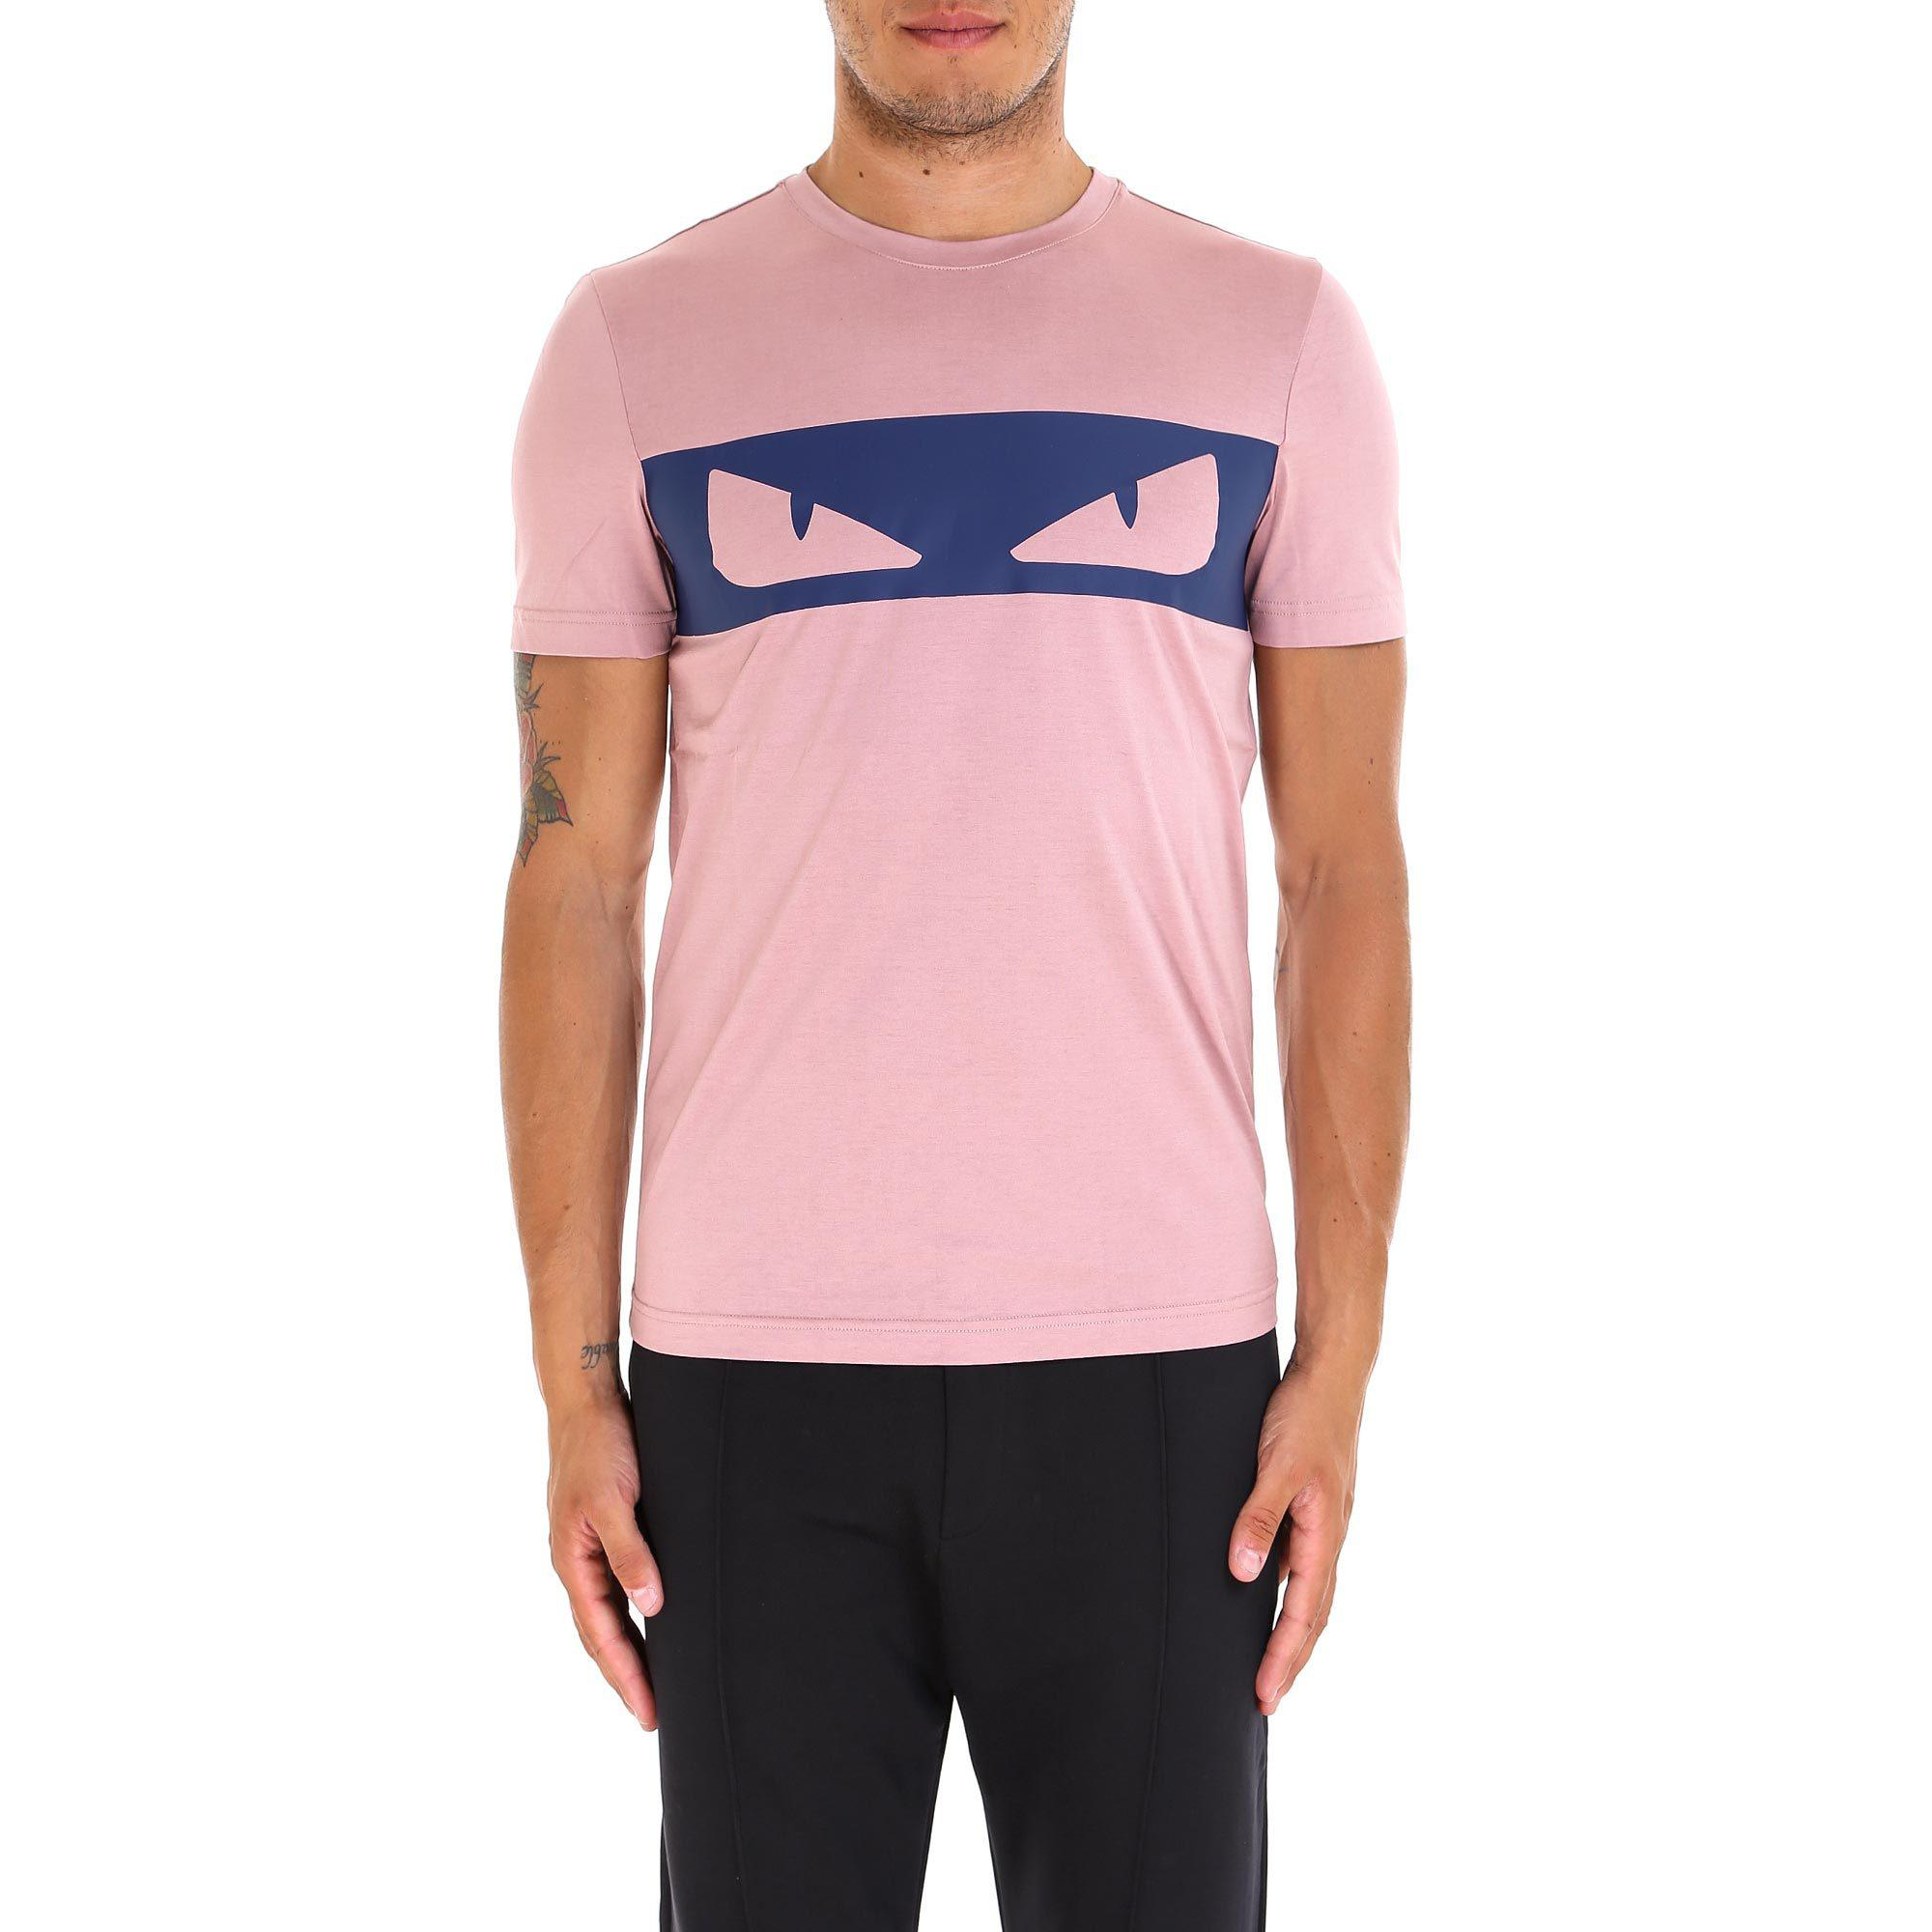 81b60d7a5 Lyst - Fendi Bag Bug Eyes T-shirt in Pink for Men